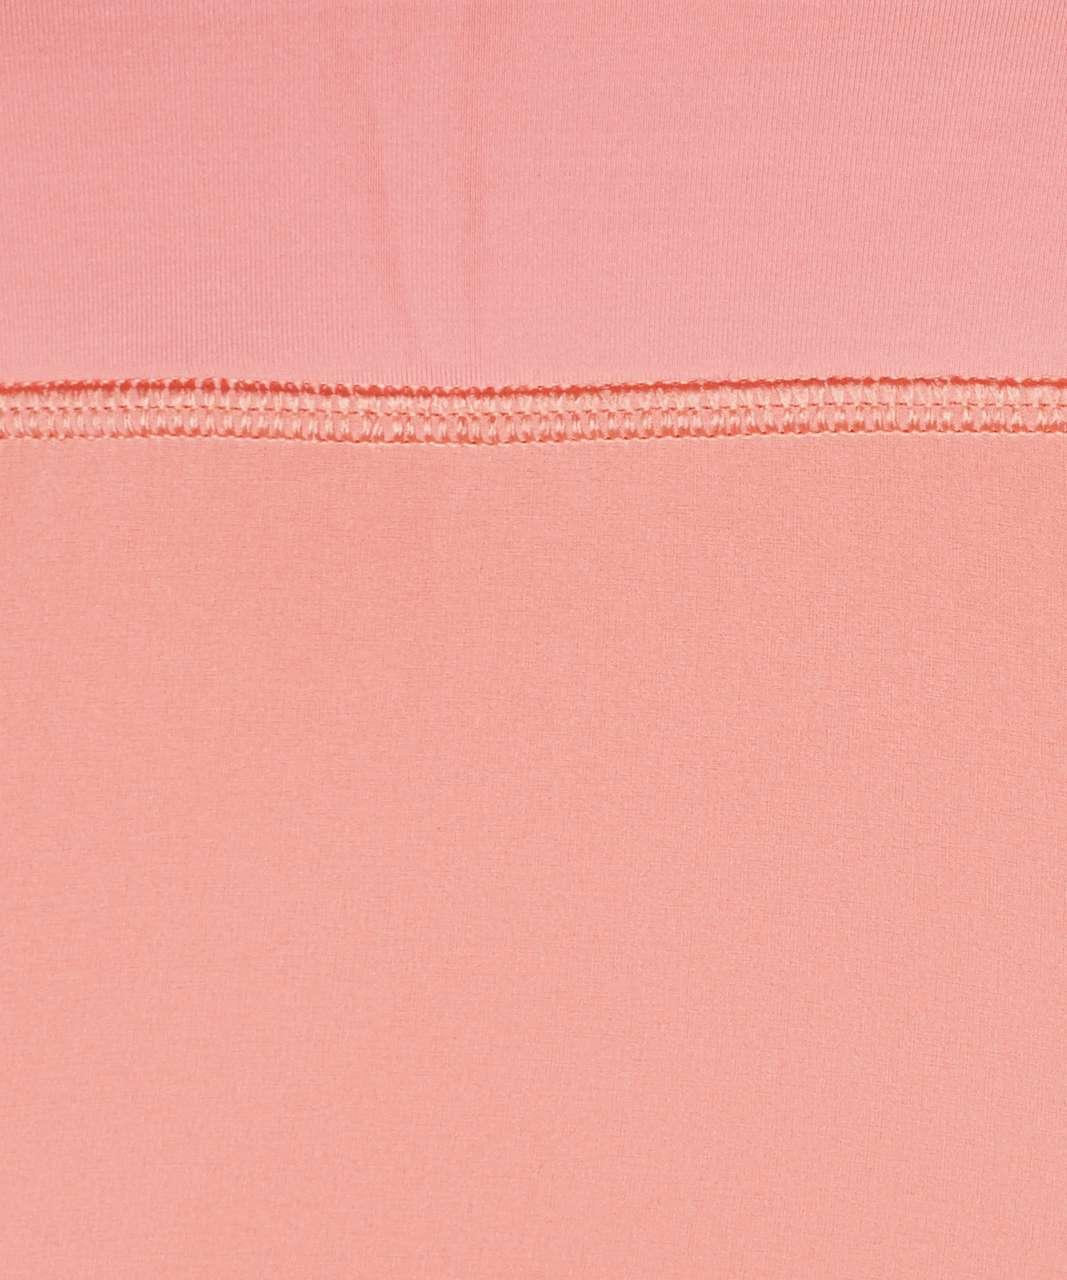 "Lululemon Play Off The Pleats Skirt *13"" - Peach Pink"